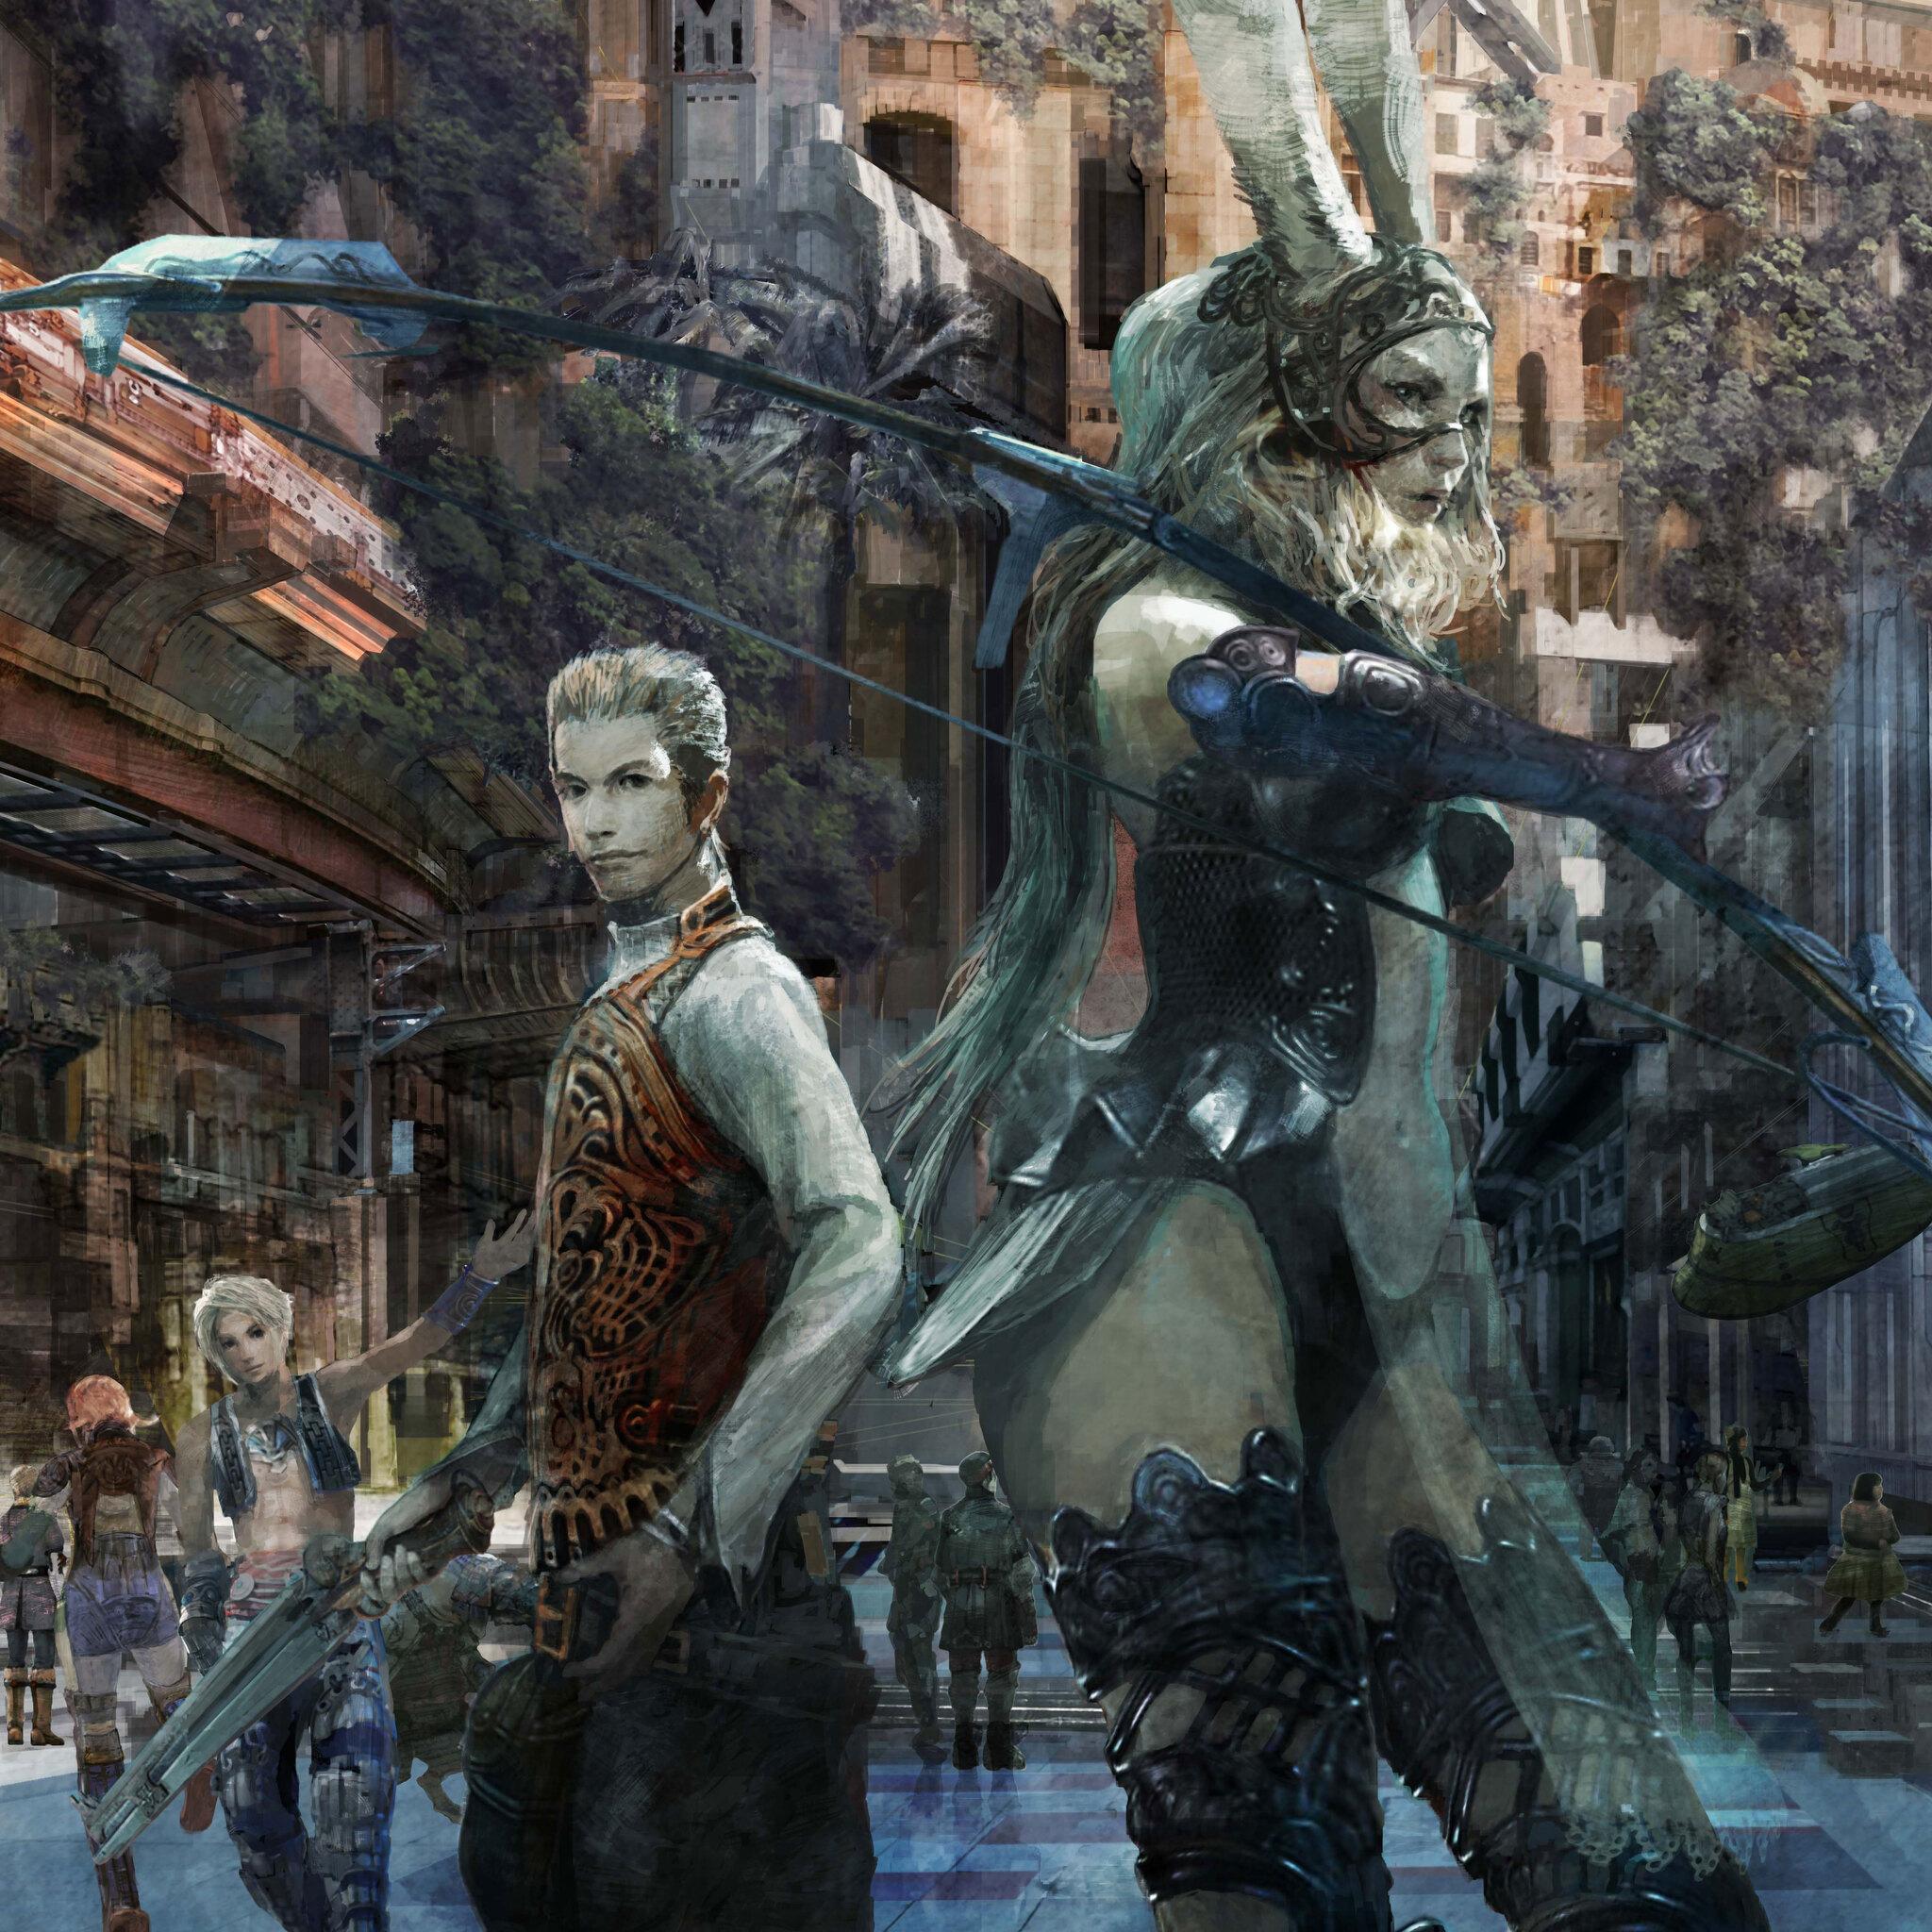 Hd Final Fantasy Wallpaper: 2048x2048 Final Fantasy XII The Zodiac Age Ipad Air HD 4k